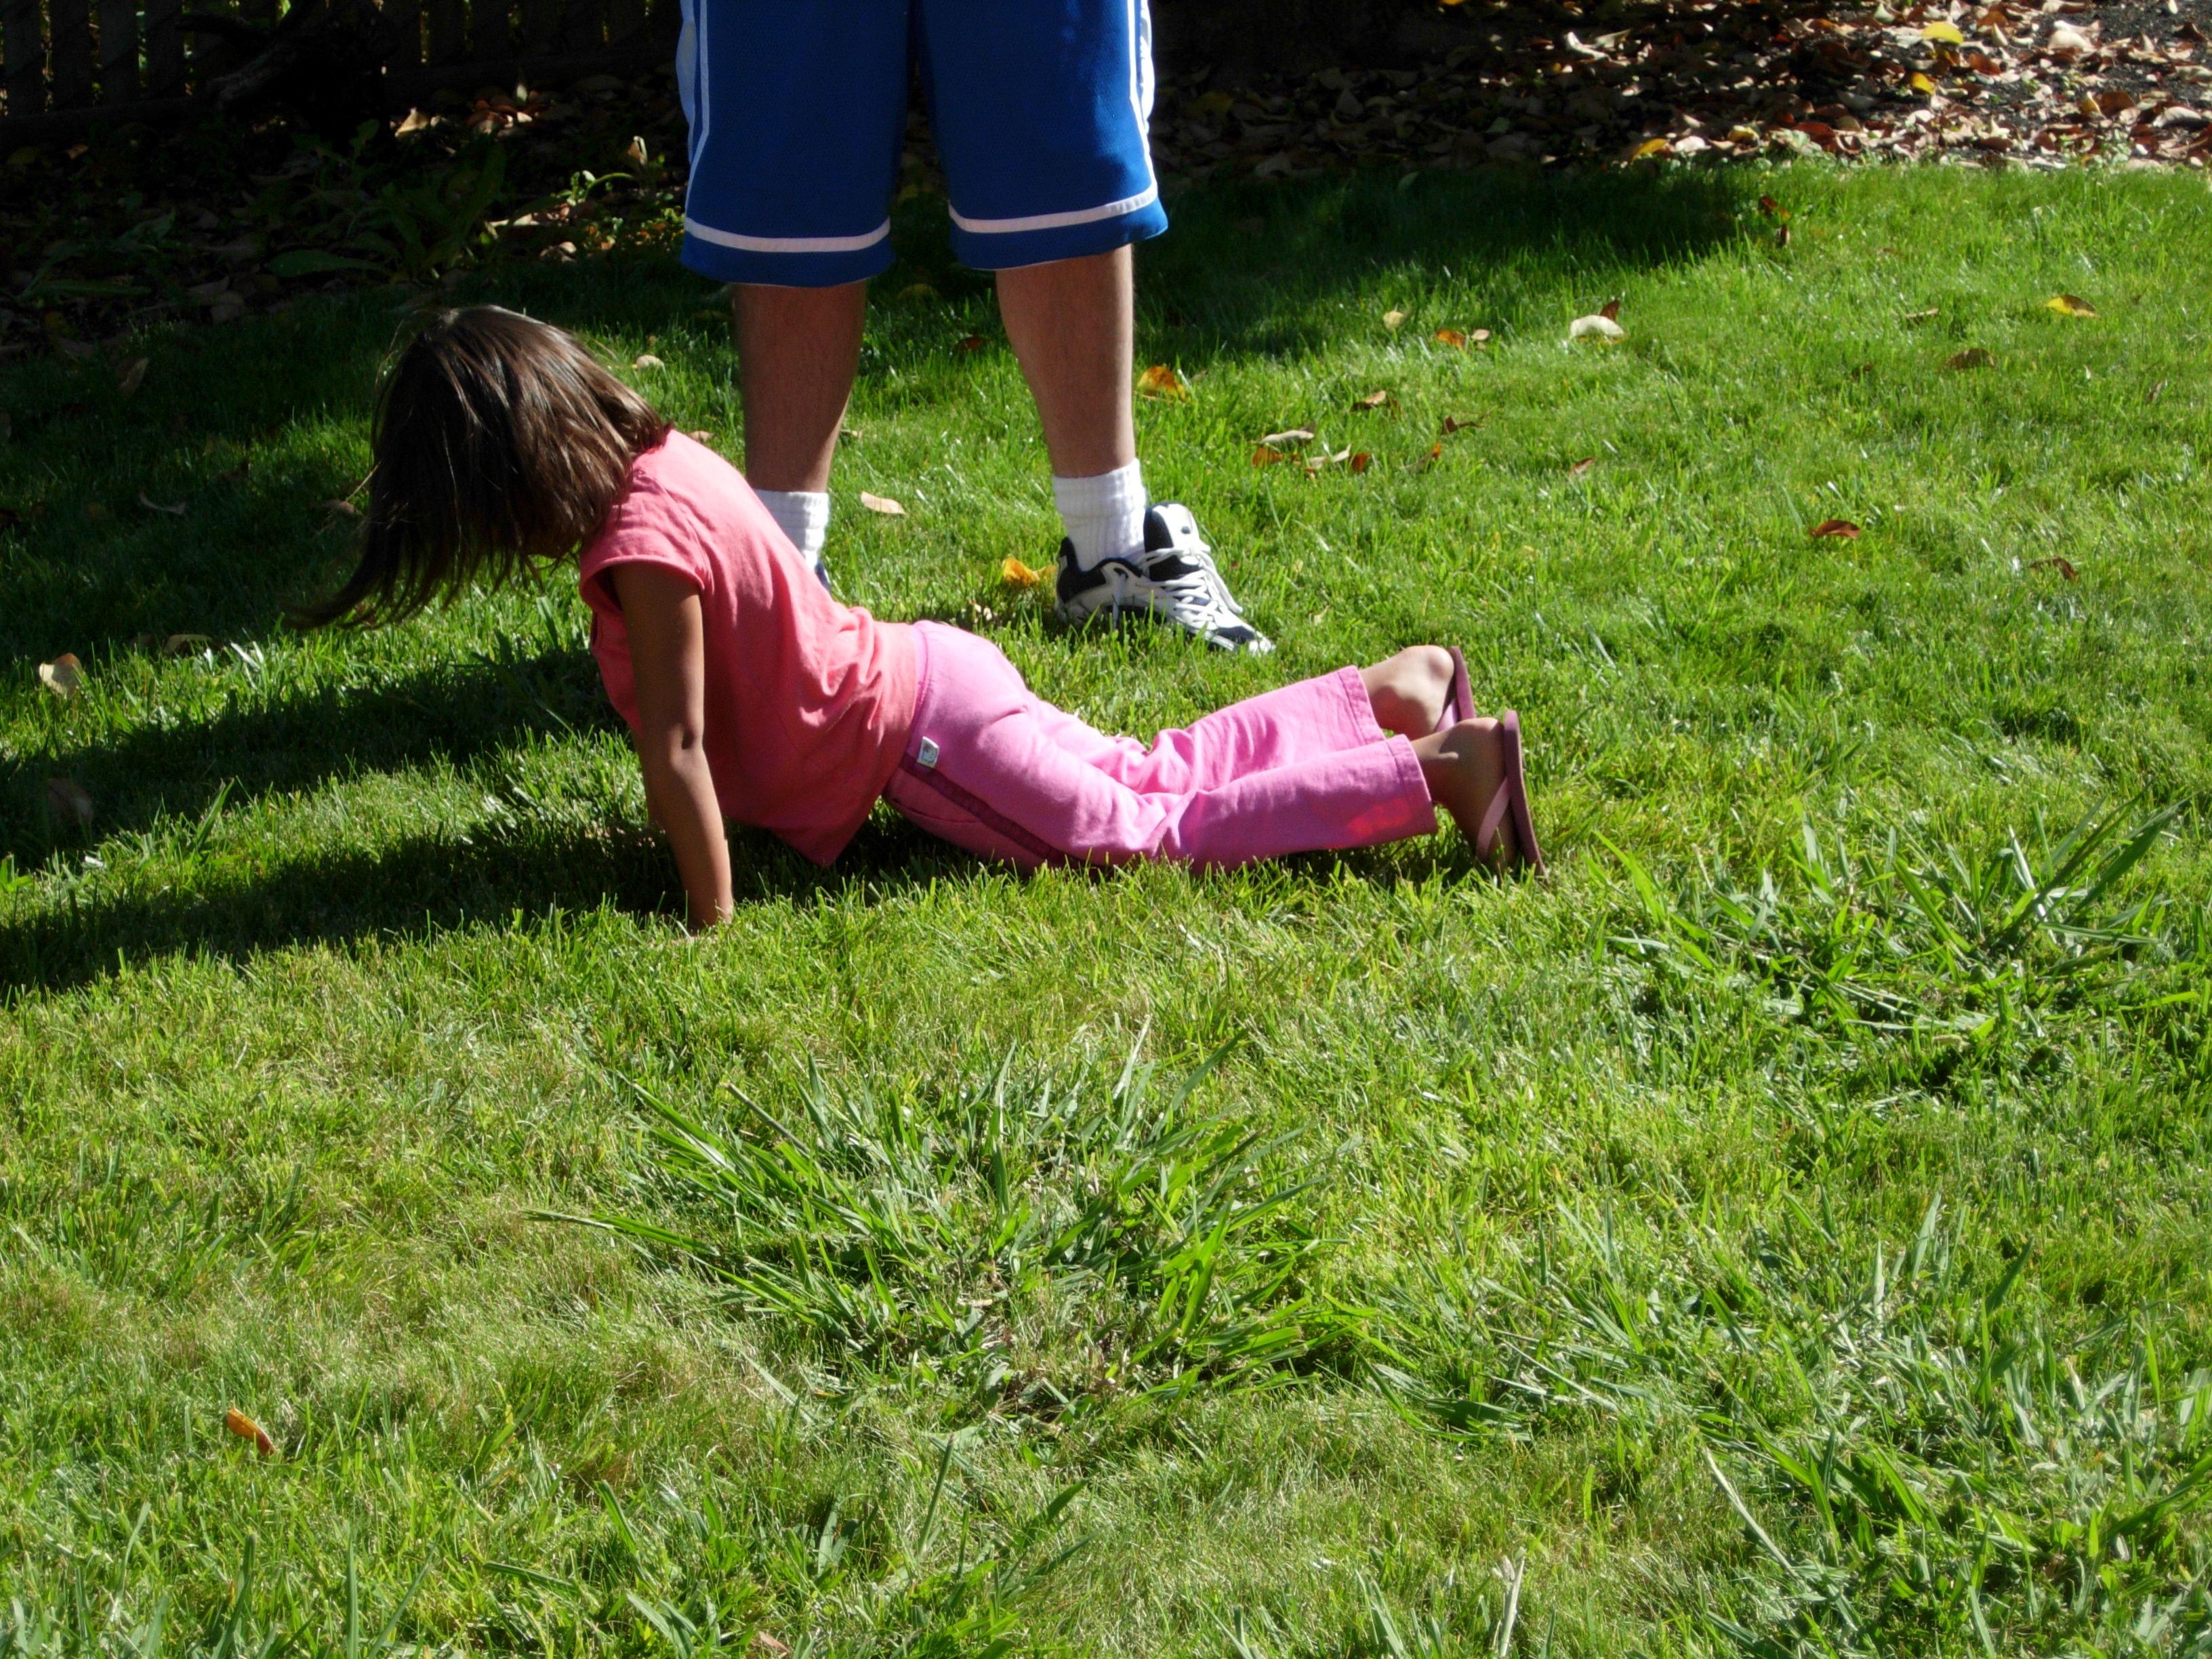 Melody doing pushups